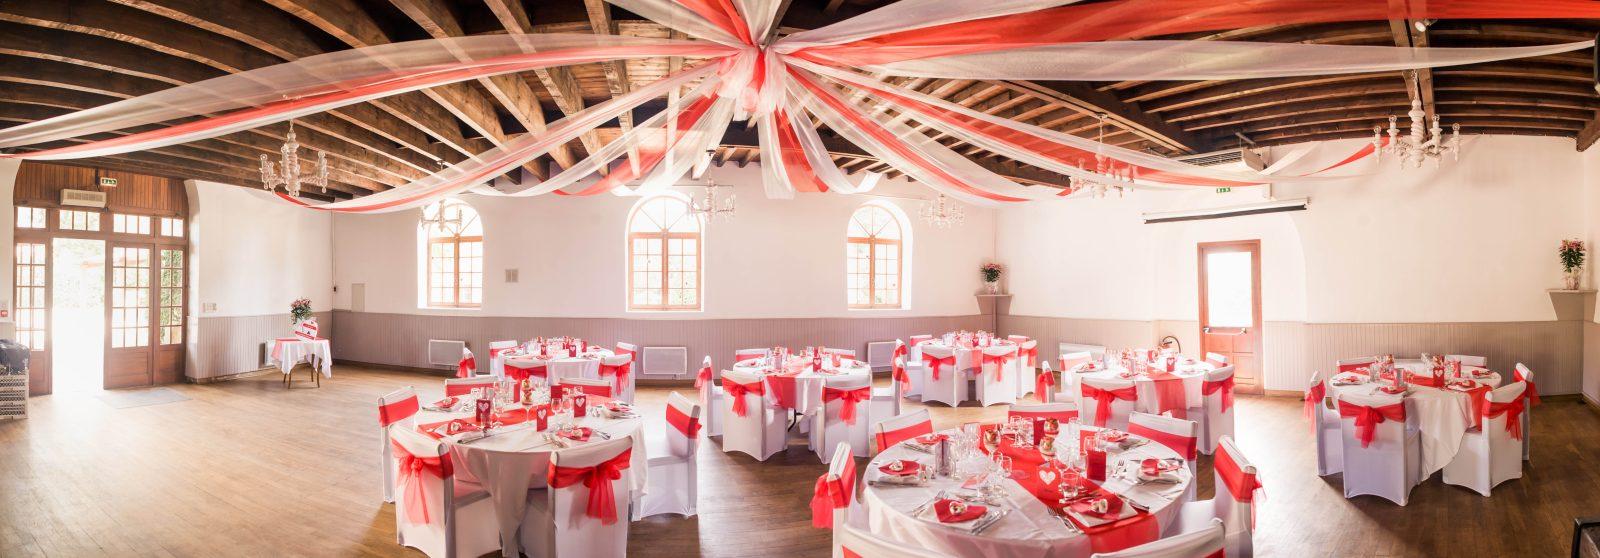 Salle Pressoir mariage rouge